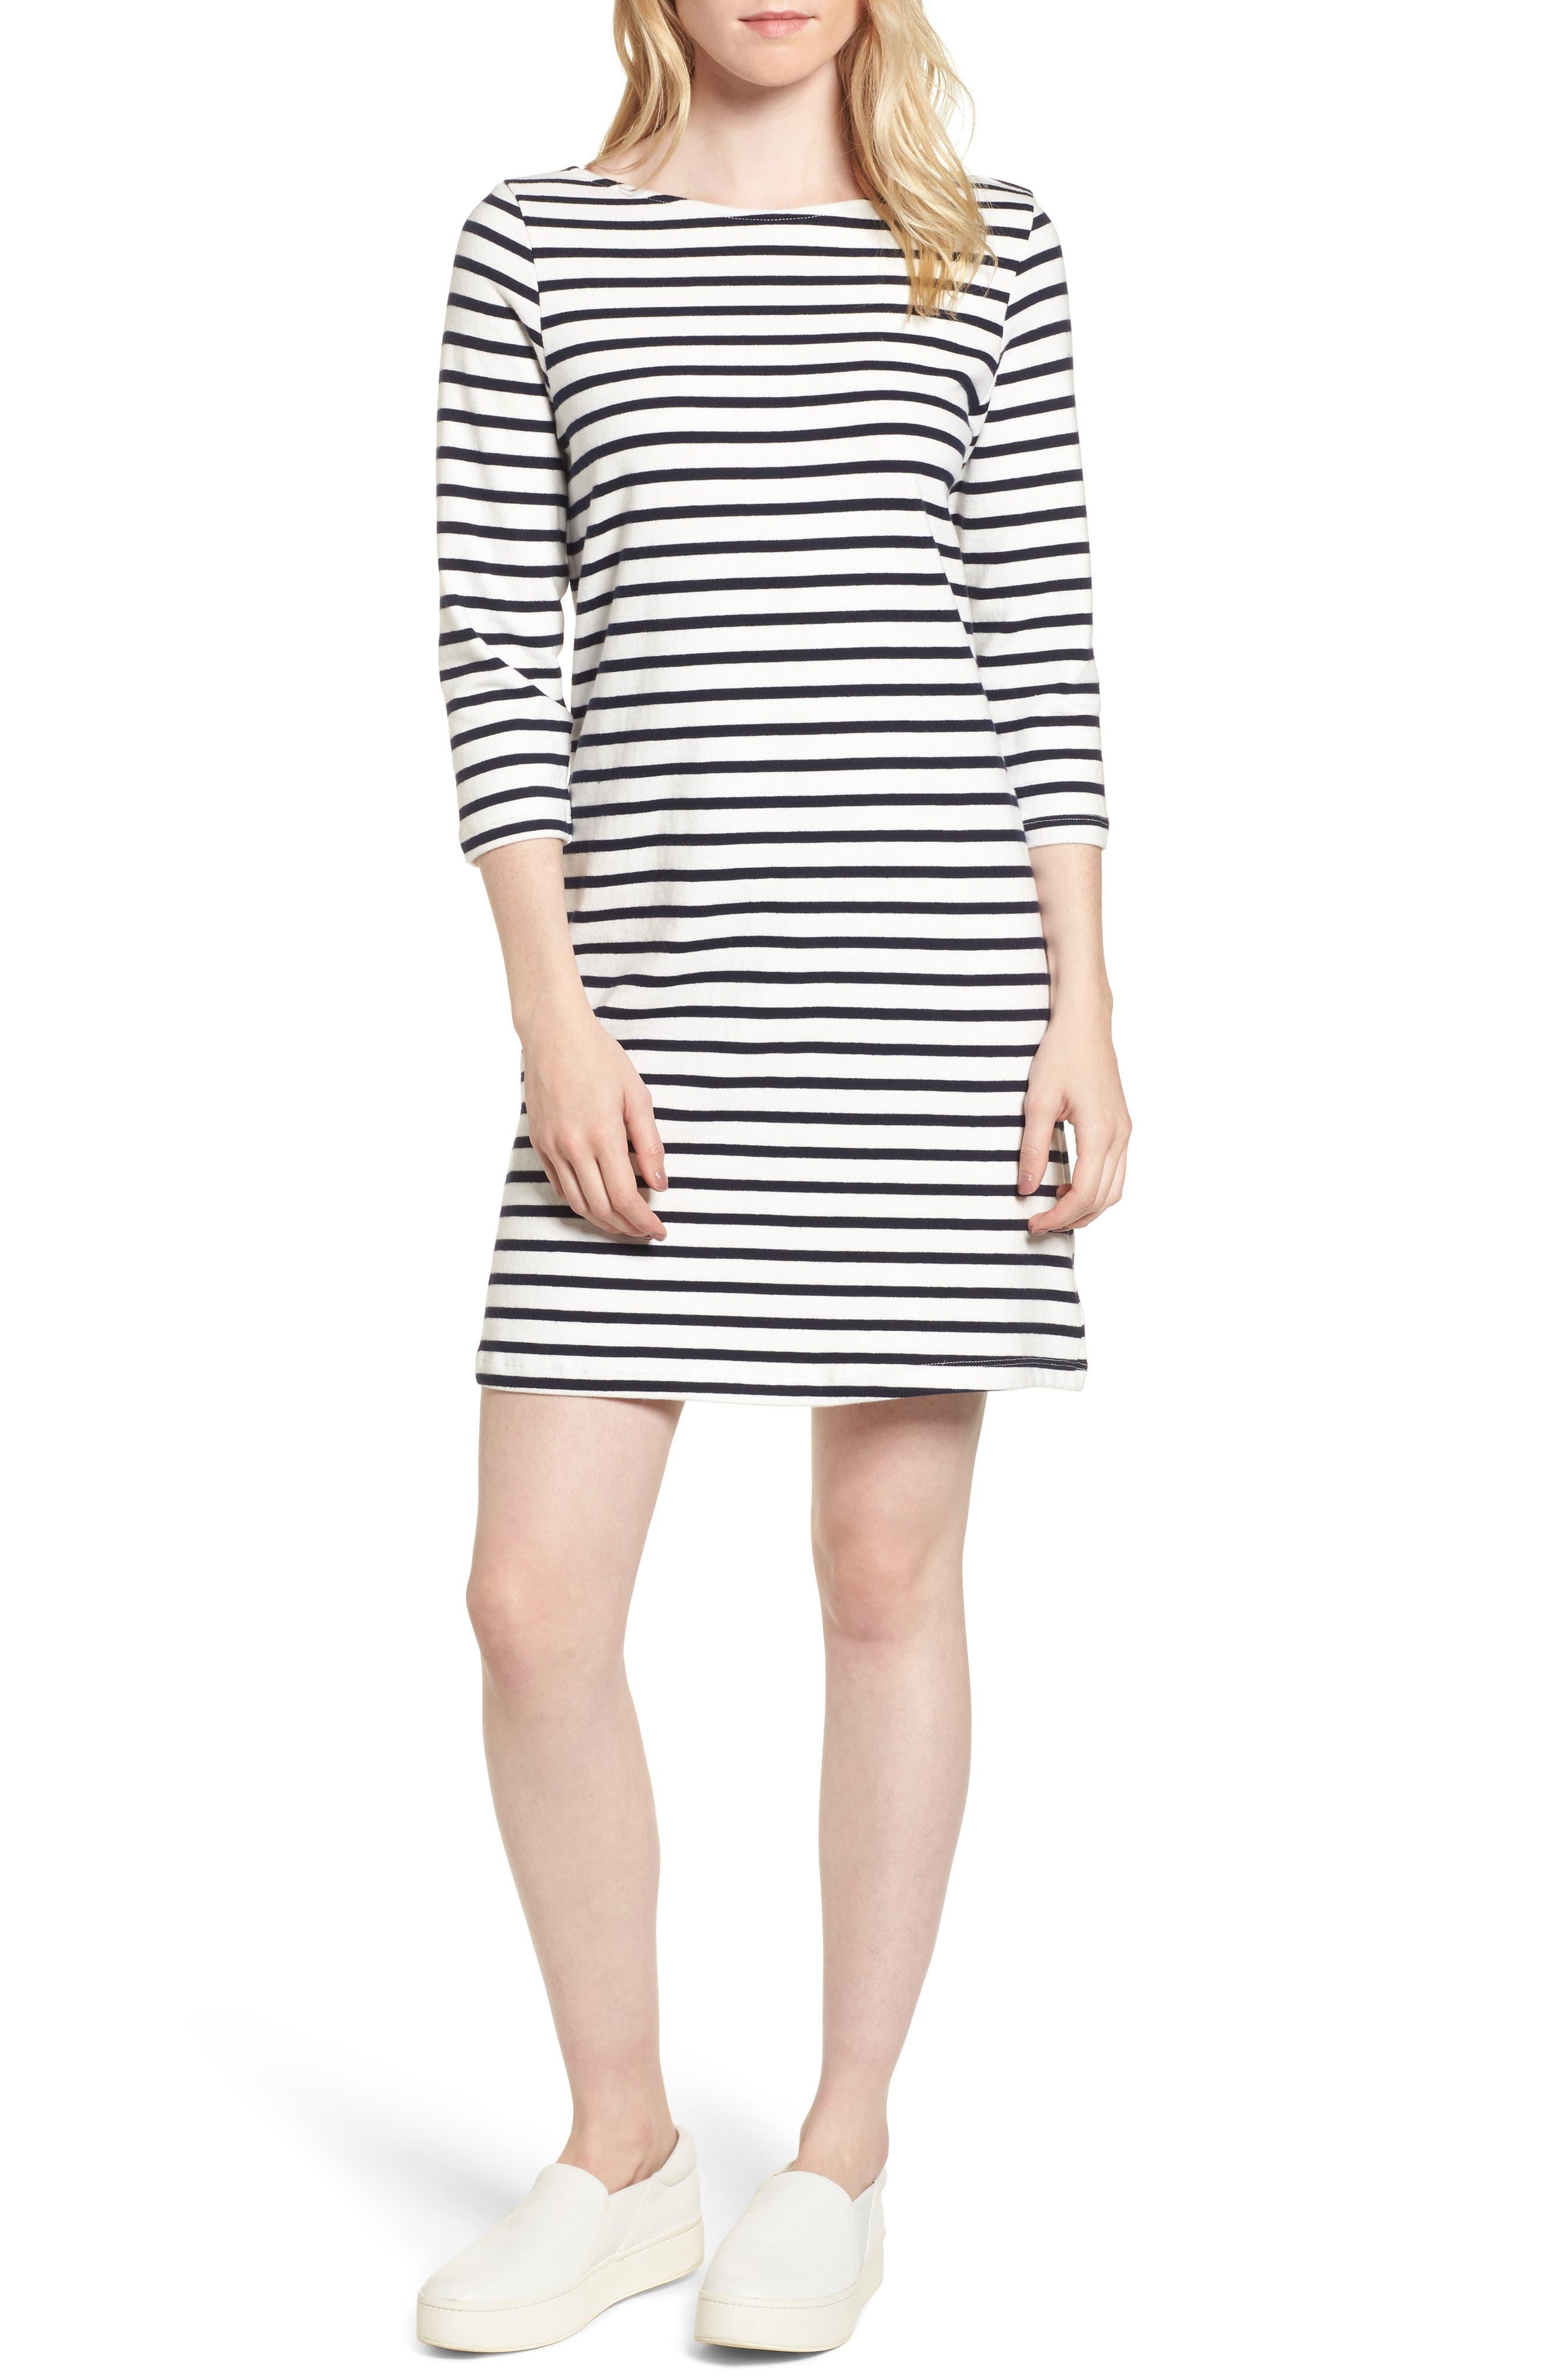 Trista Organic Cotton Dress,                         Main,                         color, 900